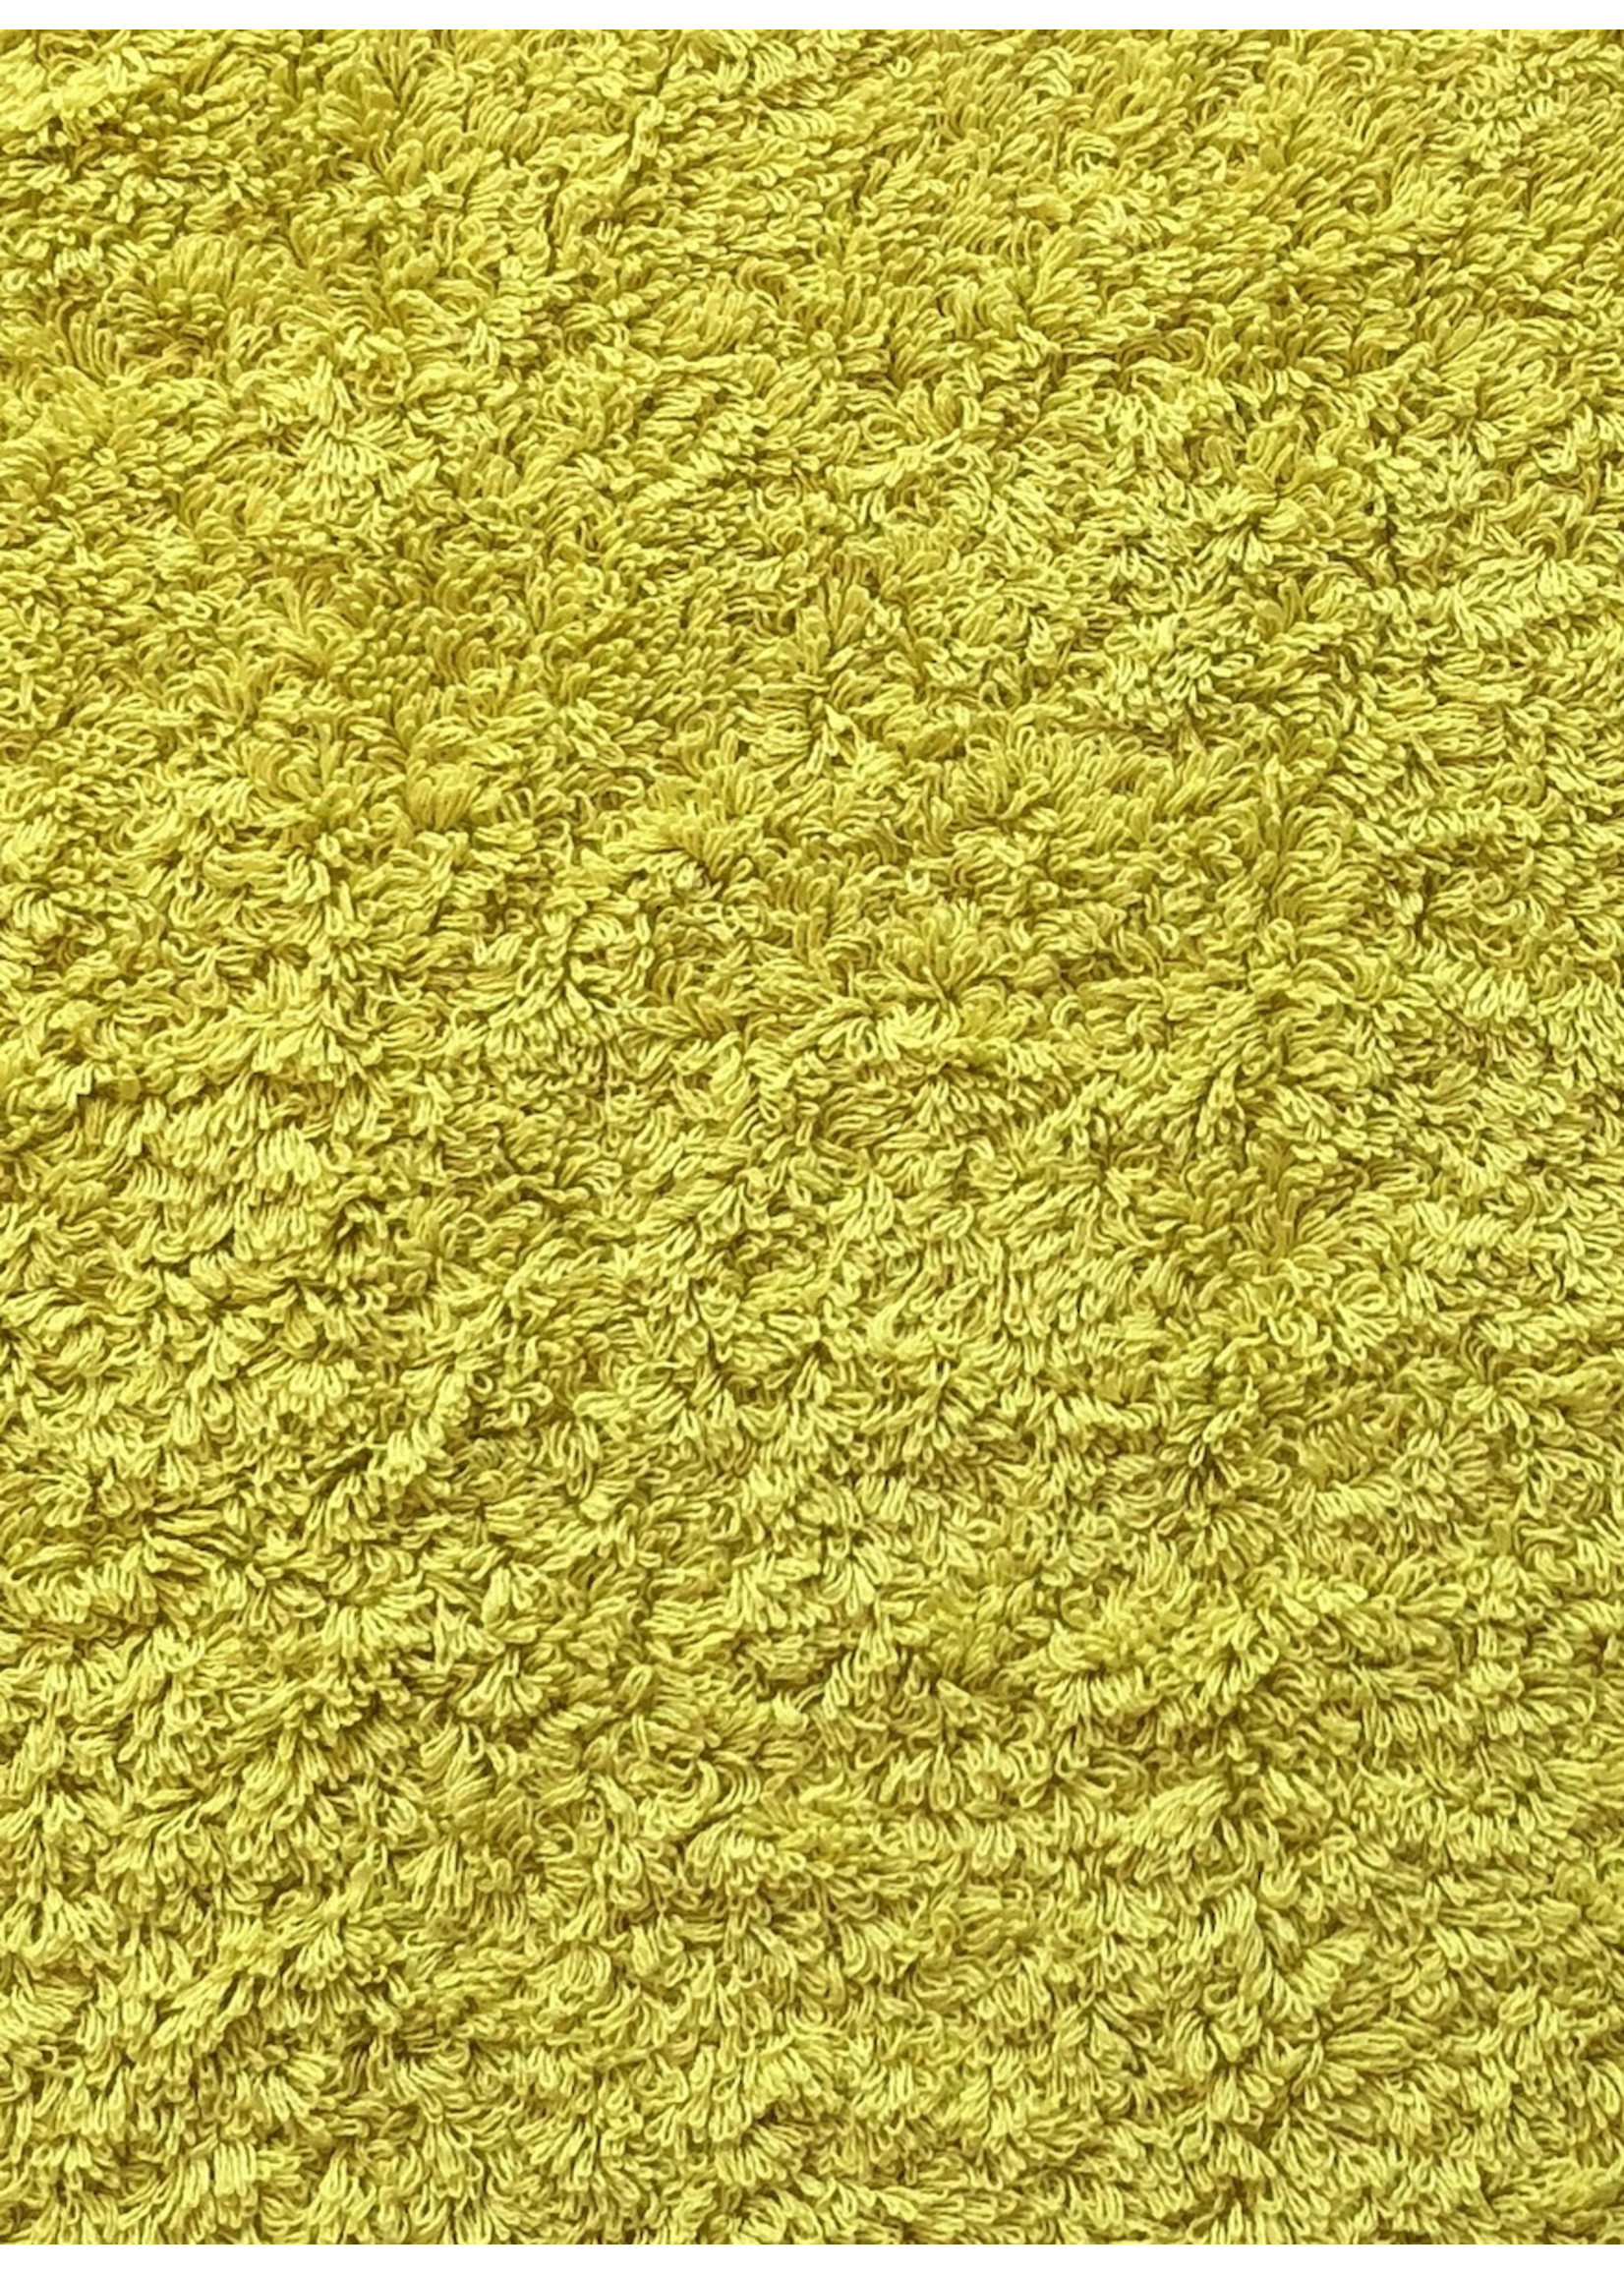 Abyss & Habidecor Super Pile Lemon Curry Towels